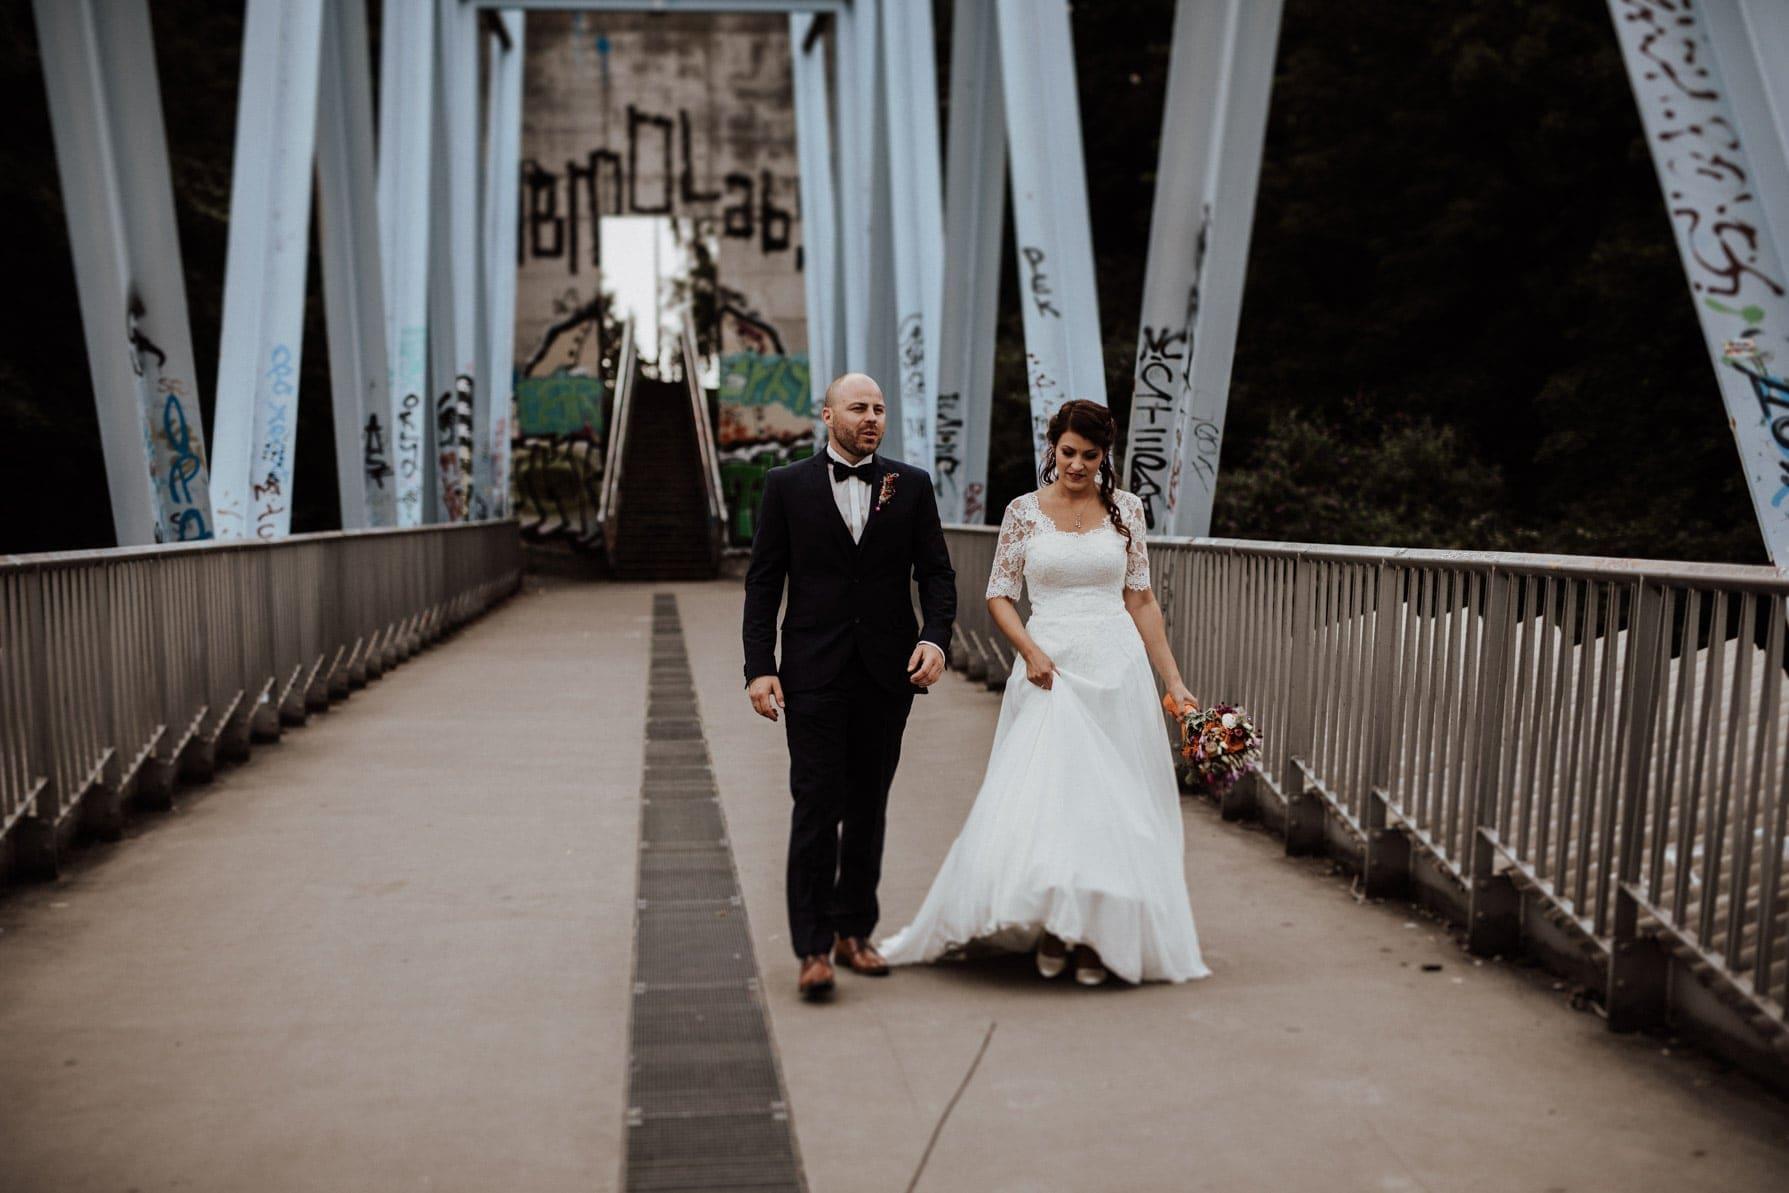 Fotoshooting Mediapark Köln Brautpaar Hochzeitsfotograf